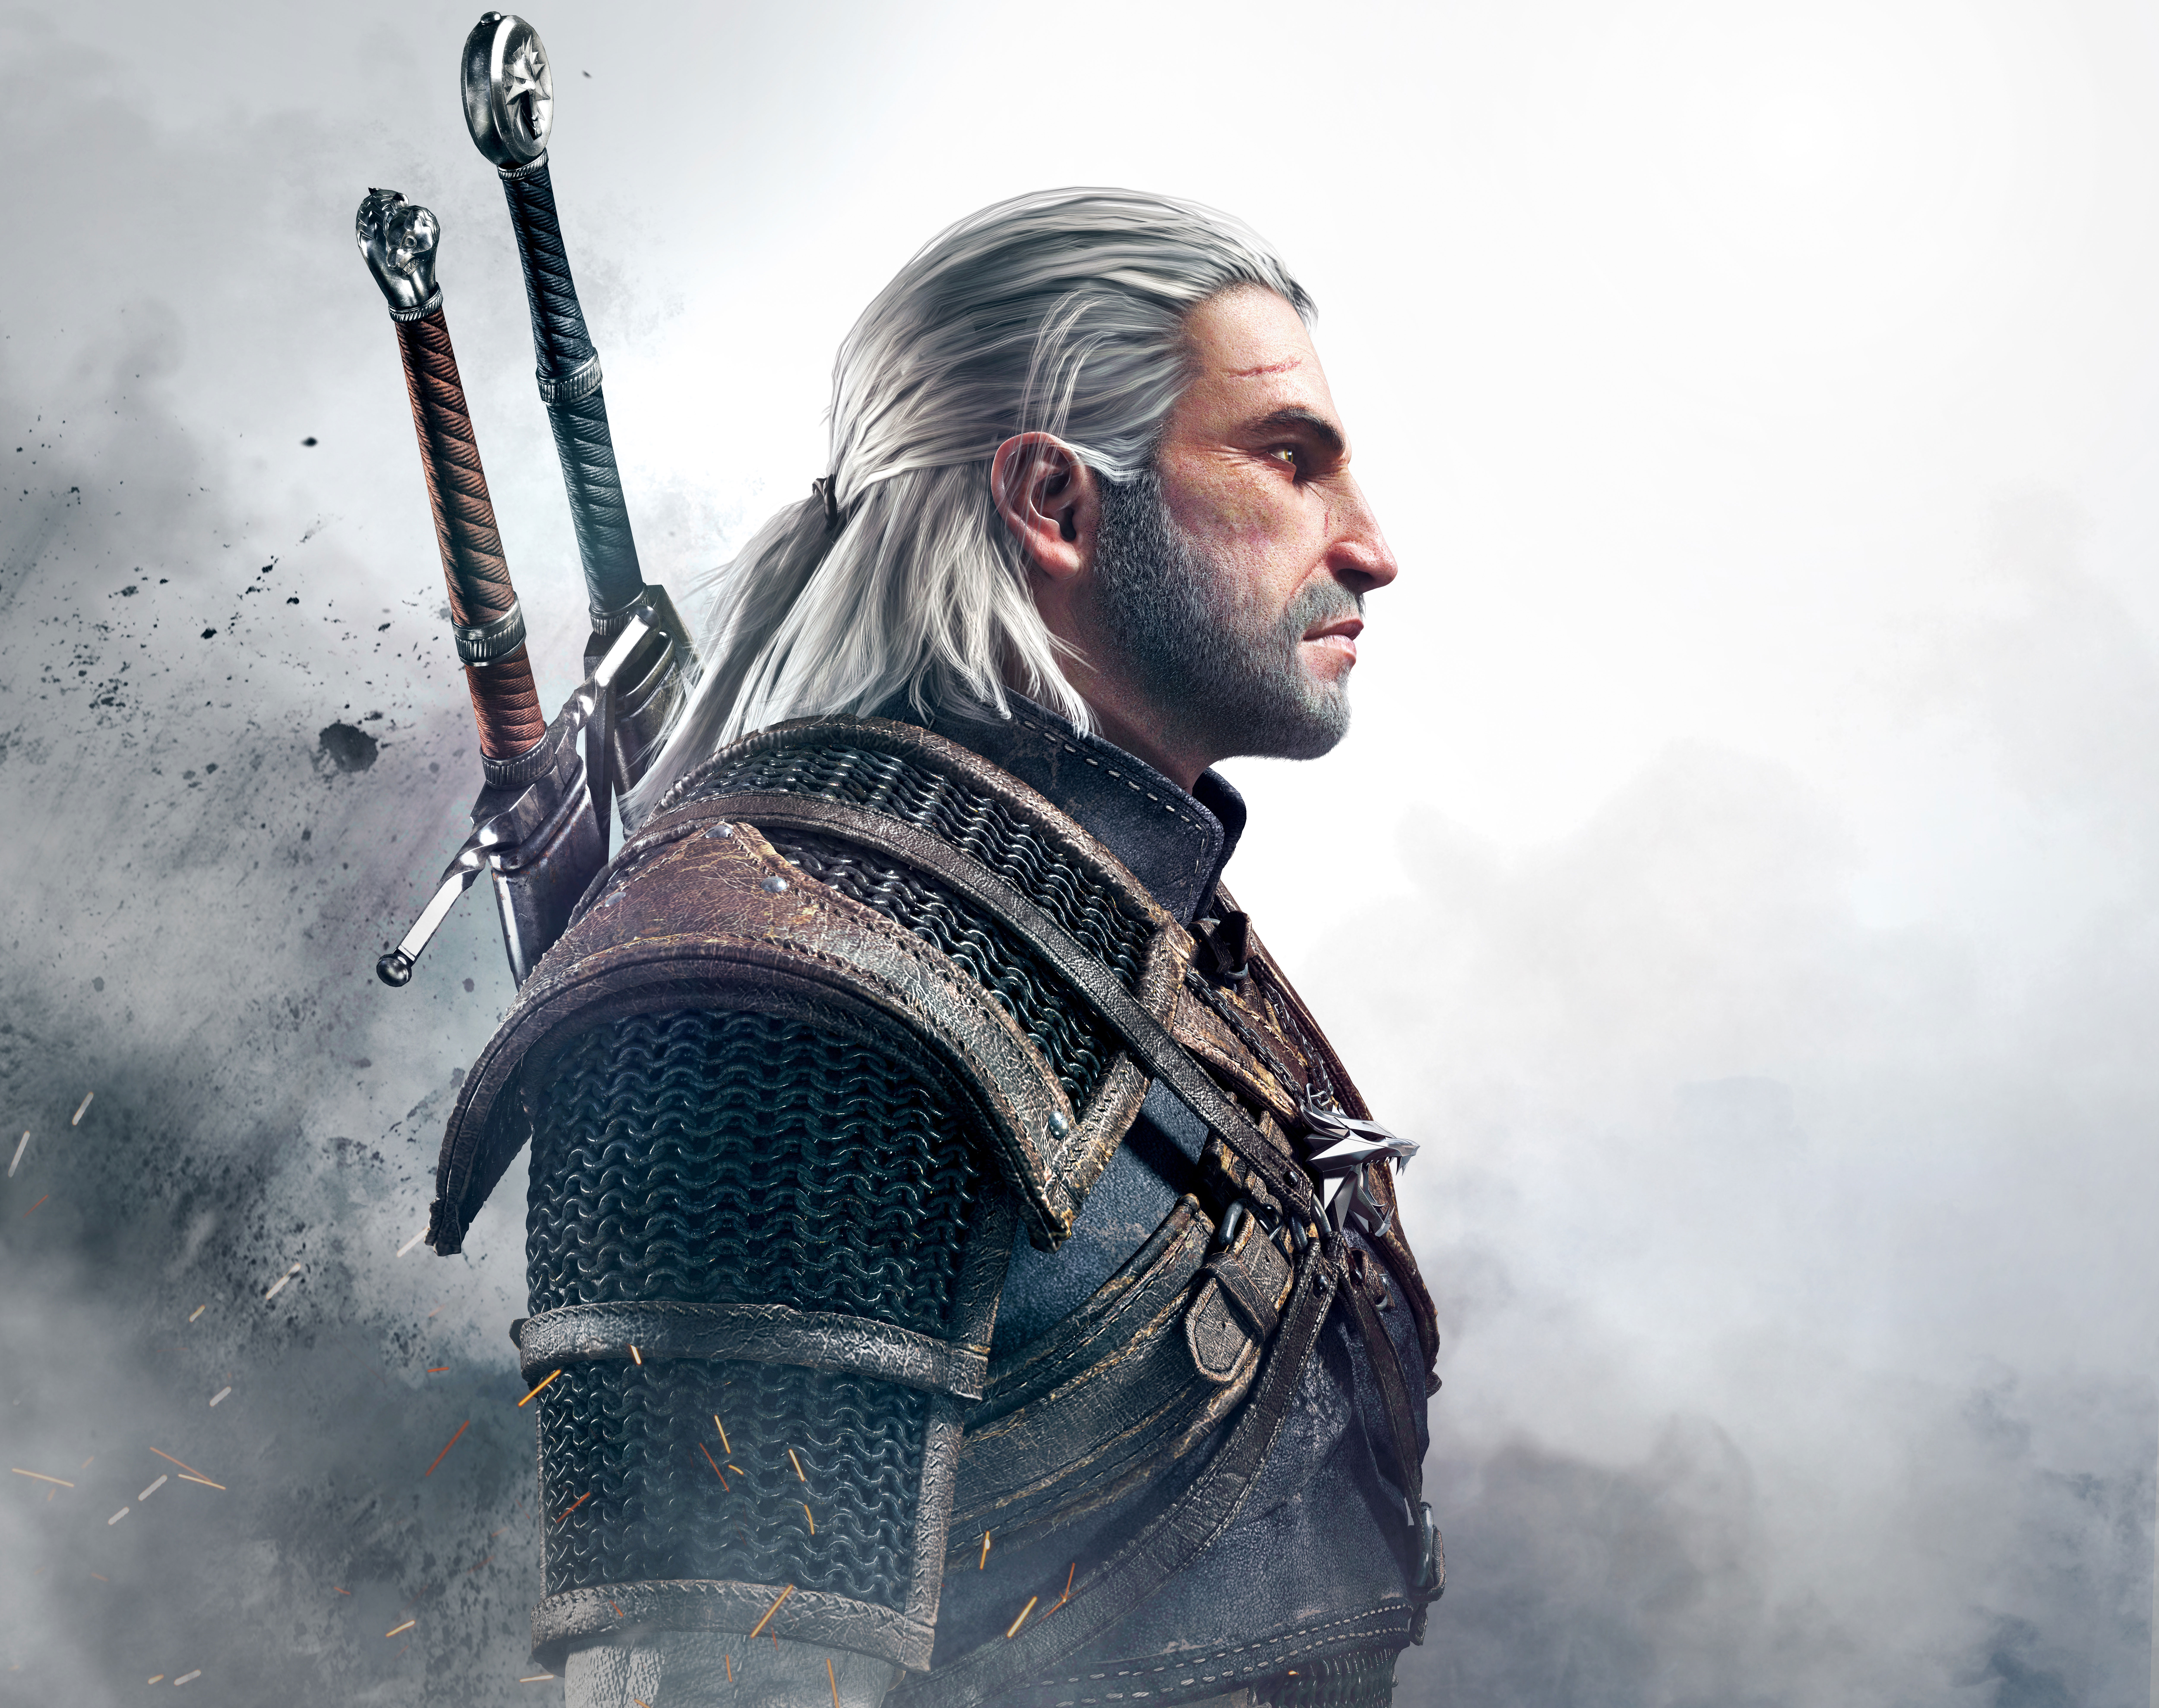 Geralt of rivia 10k hd games 4k wallpapers images - The witcher wallpaper 4k ...